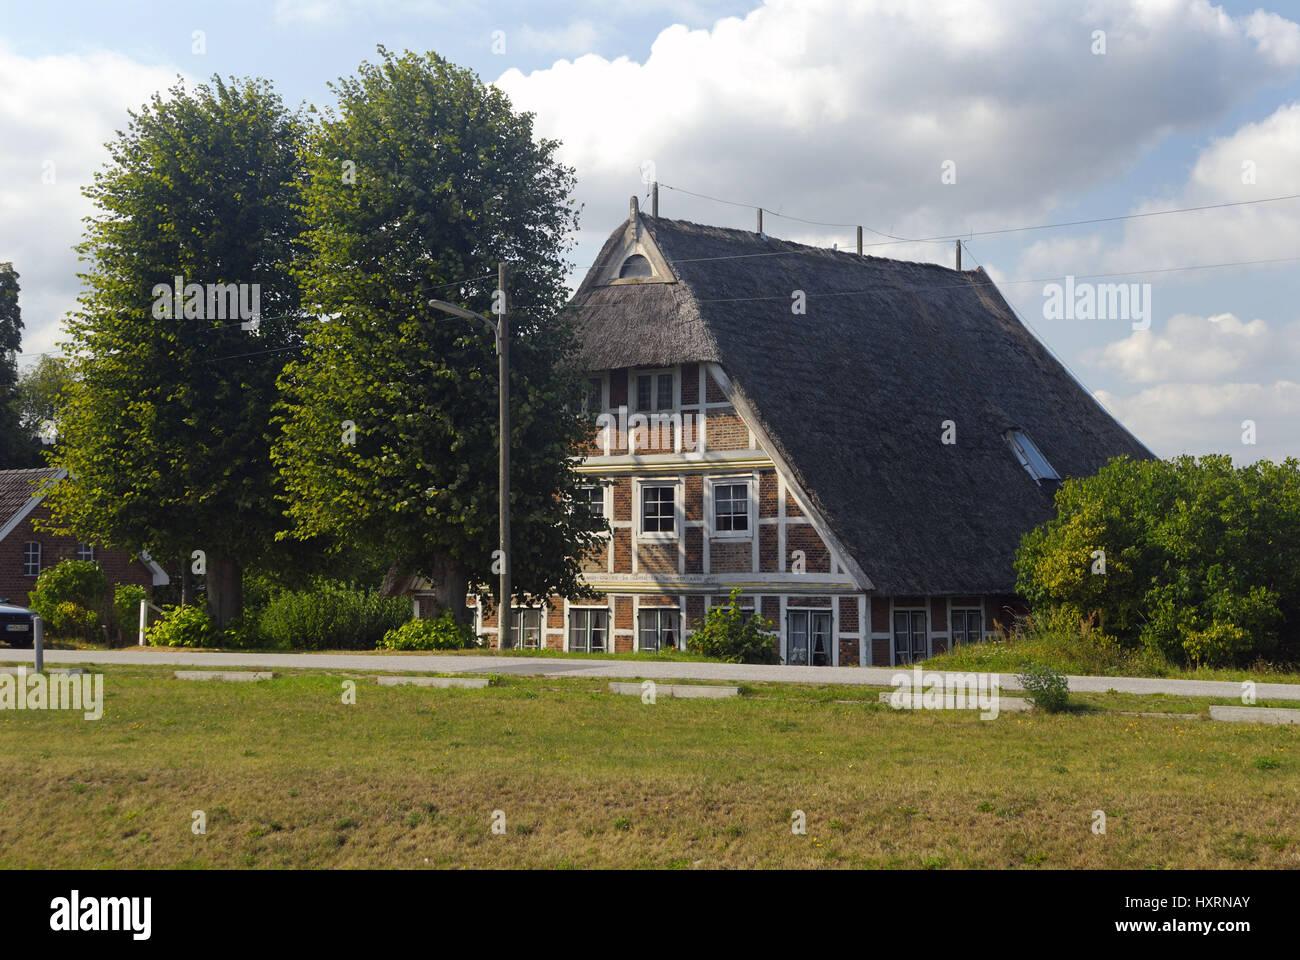 Half-timbered house in old narrow nurse, Hamburg, Germany, Europe, Fachwerkhaus in Altengamme, Deutschland, Europa Stock Photo